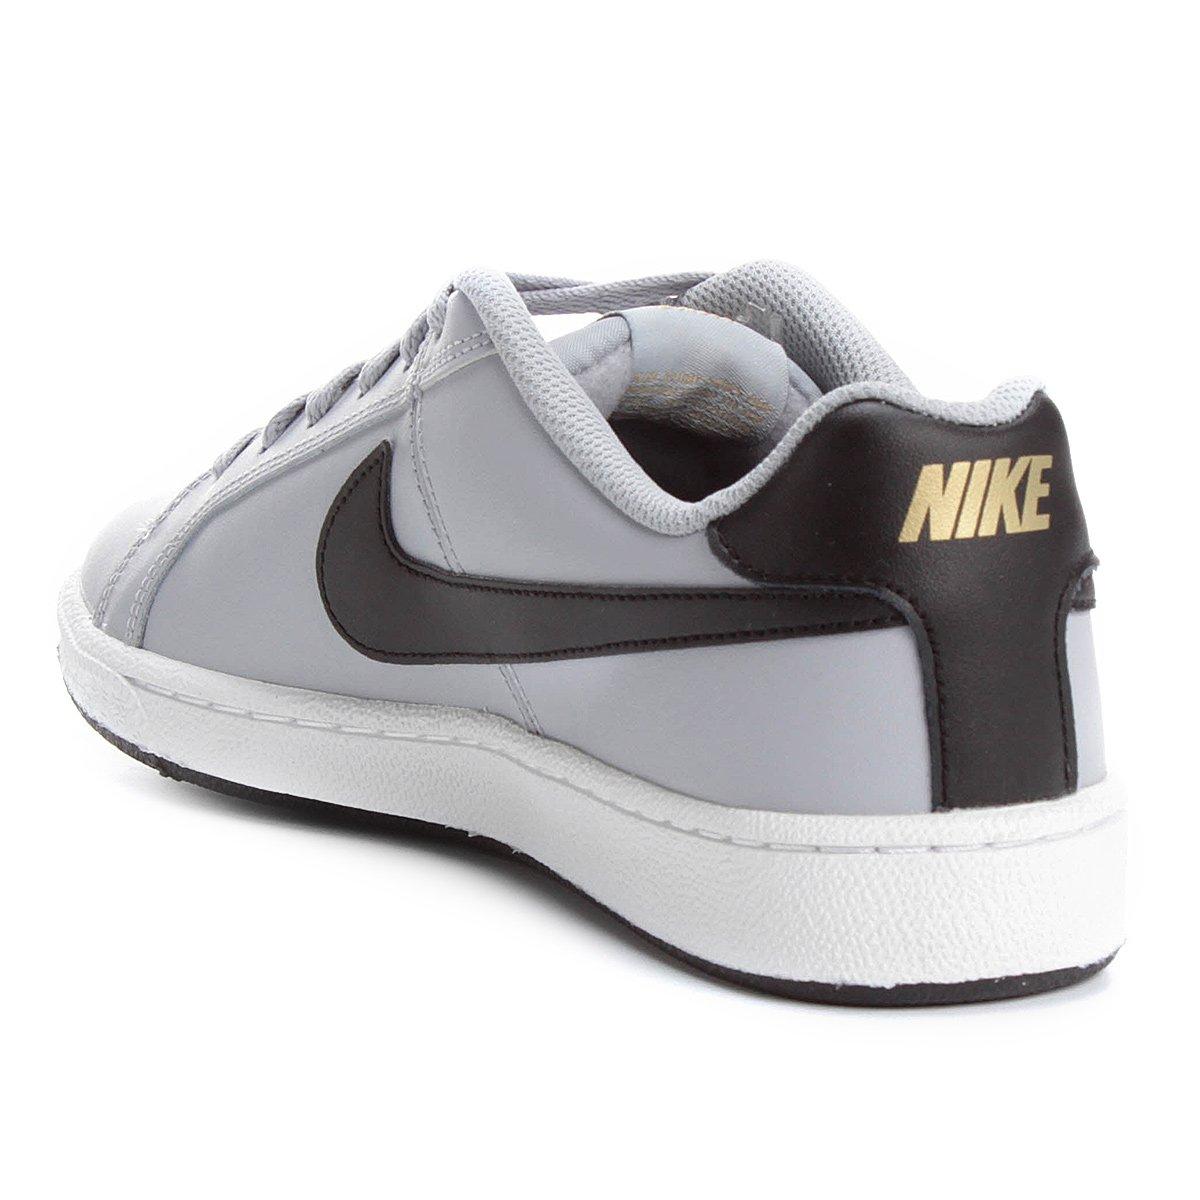 a2abce6368 Tênis Couro Nike Court Royale Masculino - Cinza - Compre Agora ...